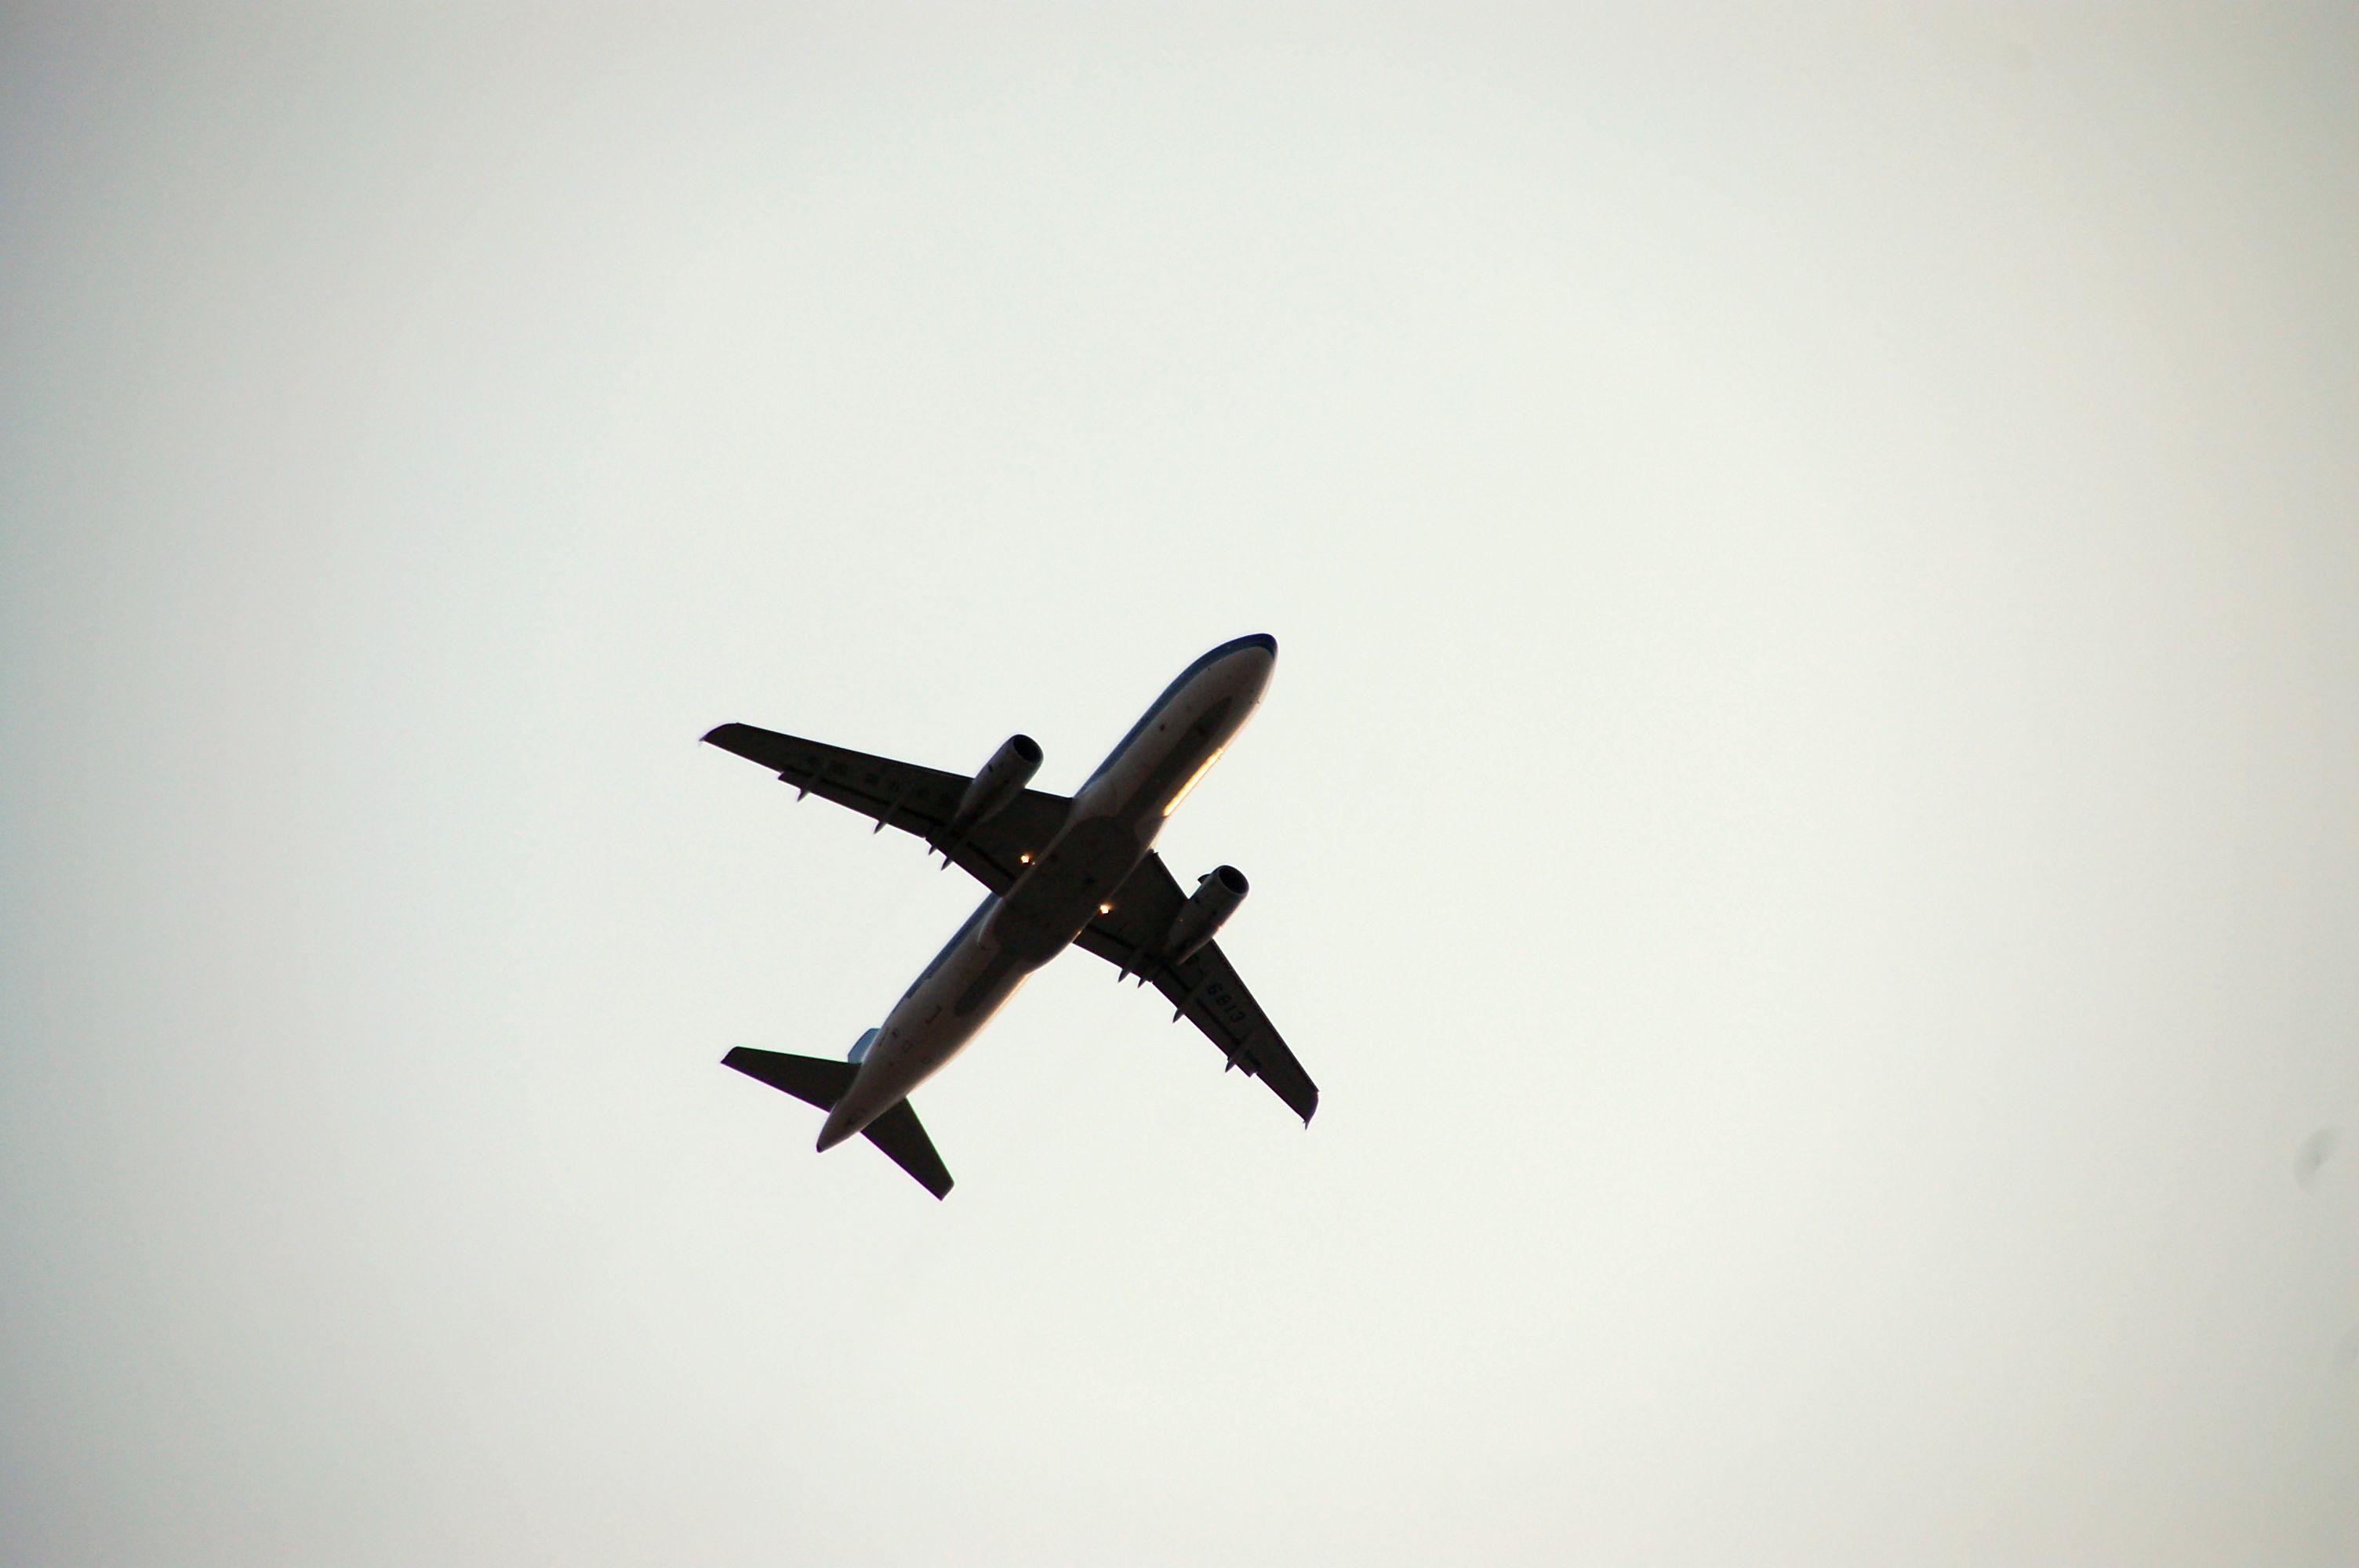 Re:丹东浪头机场随拍 AIRBUS A320-200 B-6813 中国丹东浪头机场